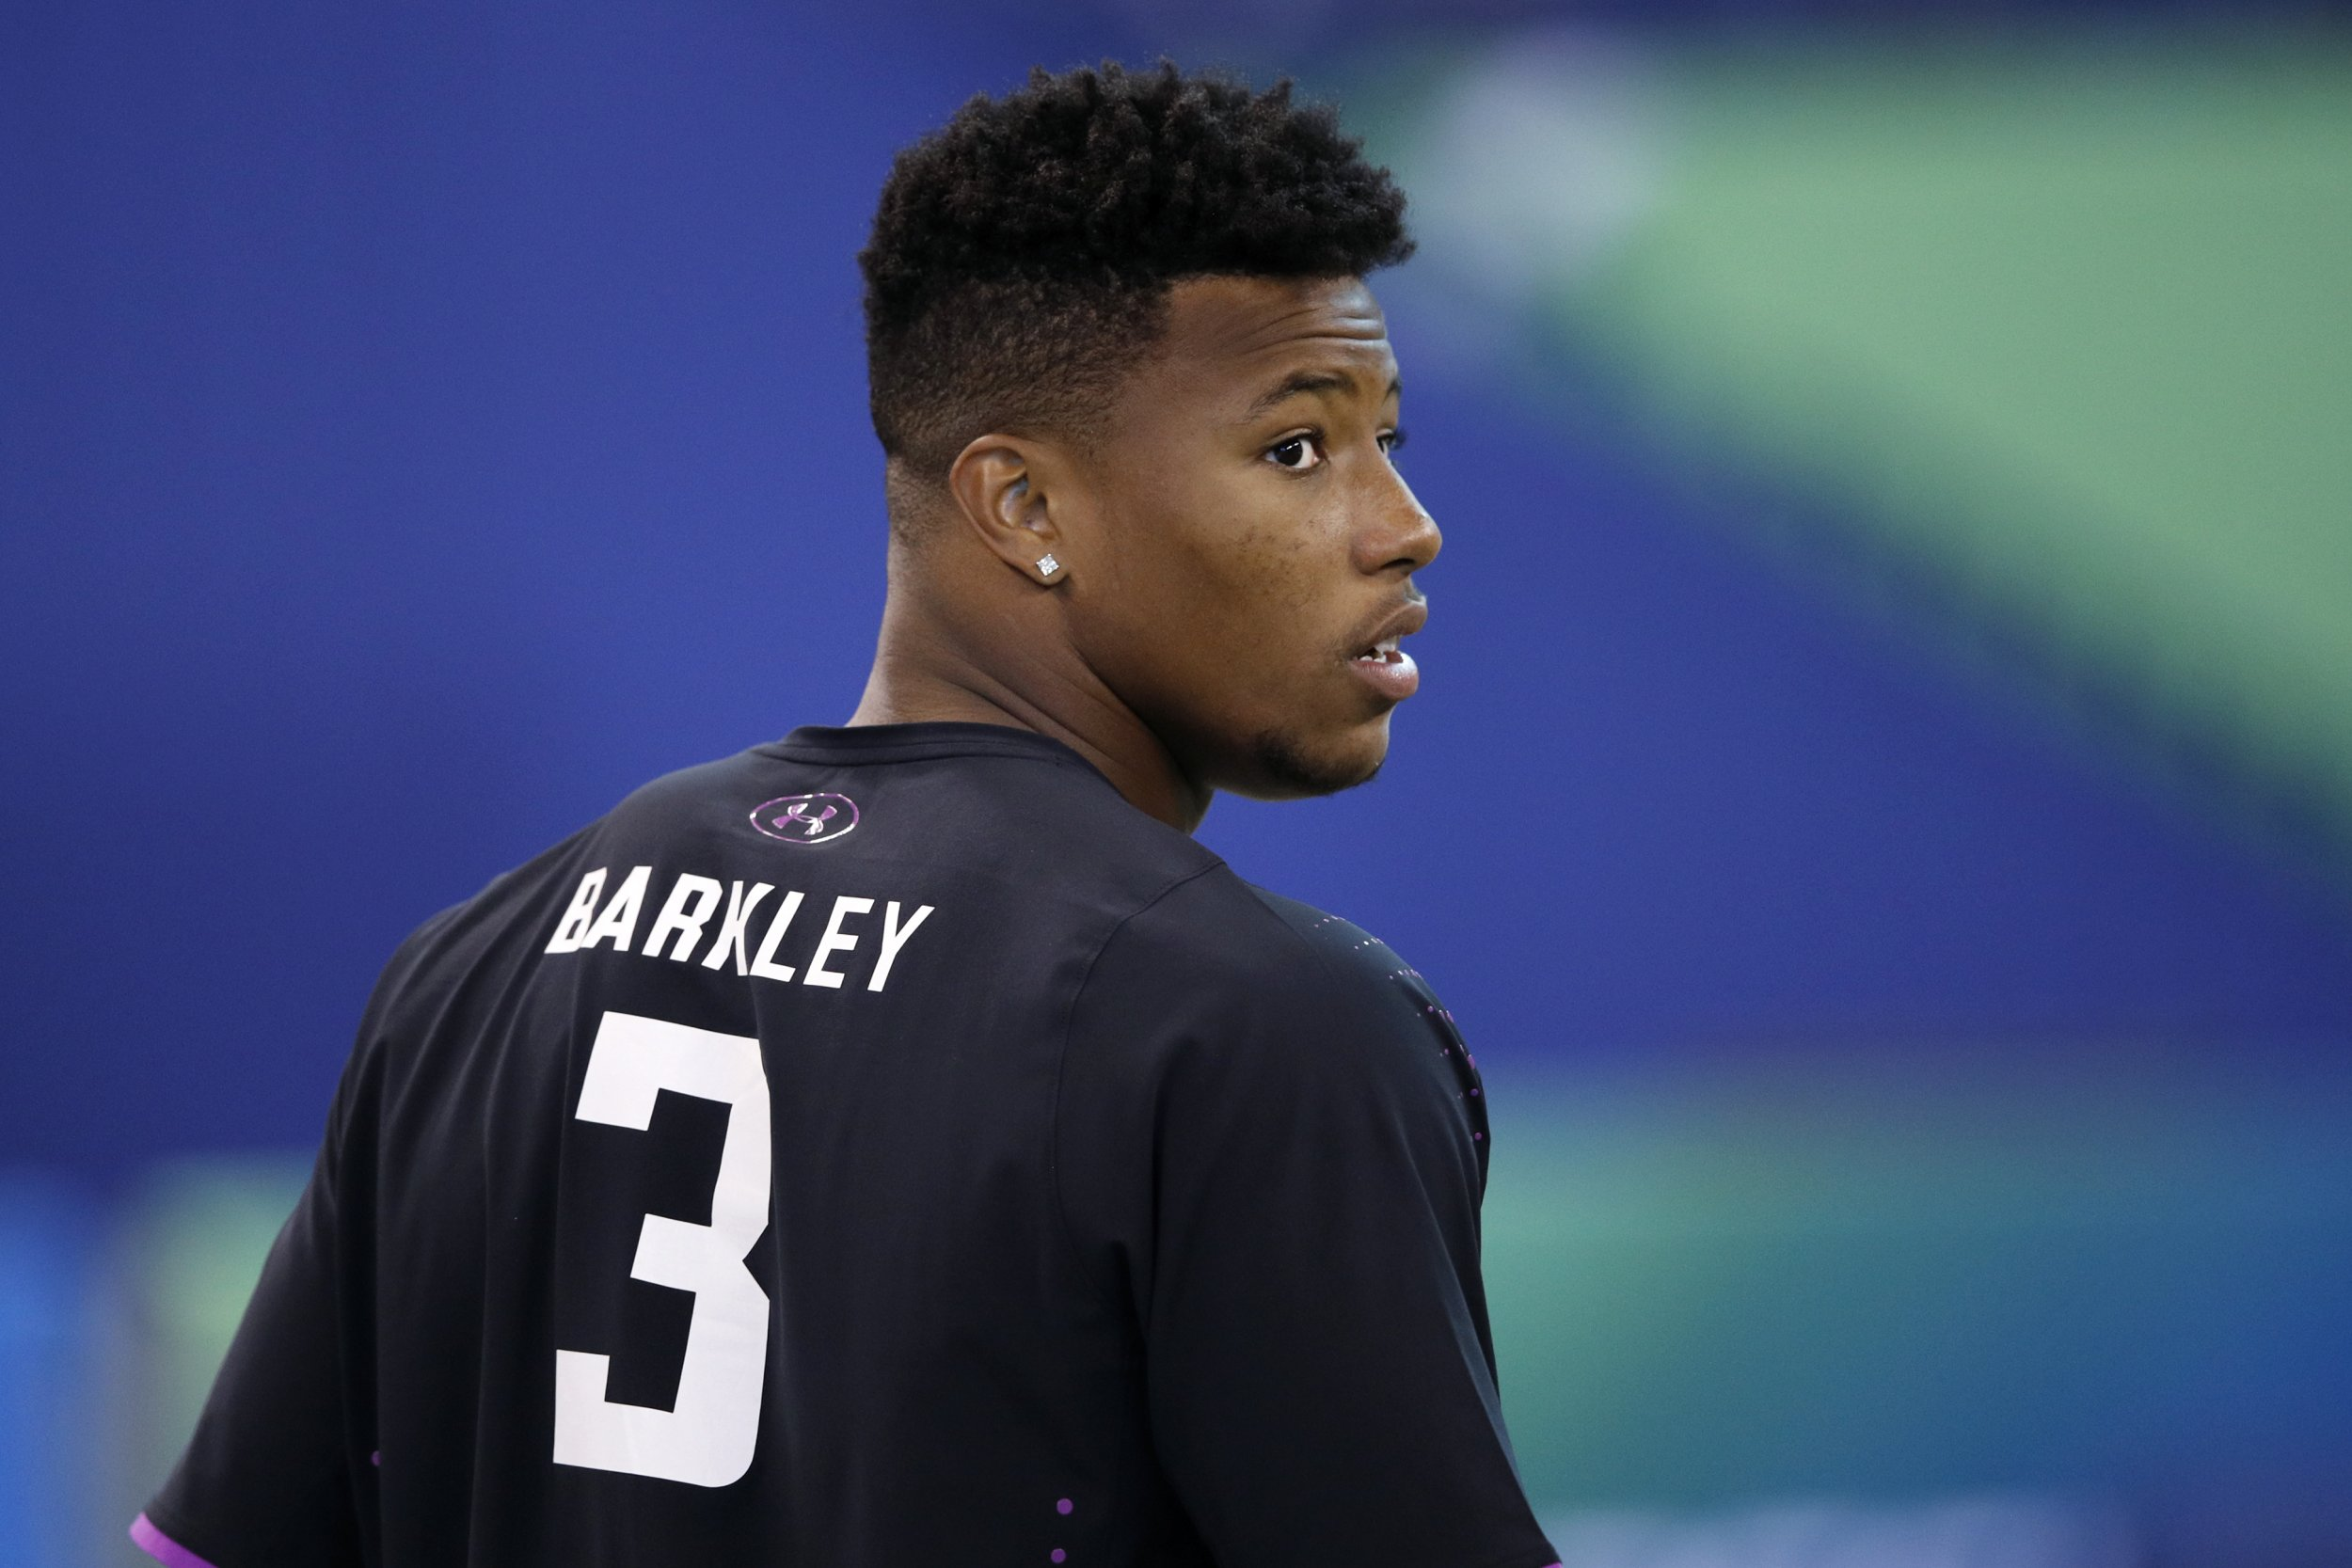 Saquon Barkley To The Giants Penn State Star Denies Nfl